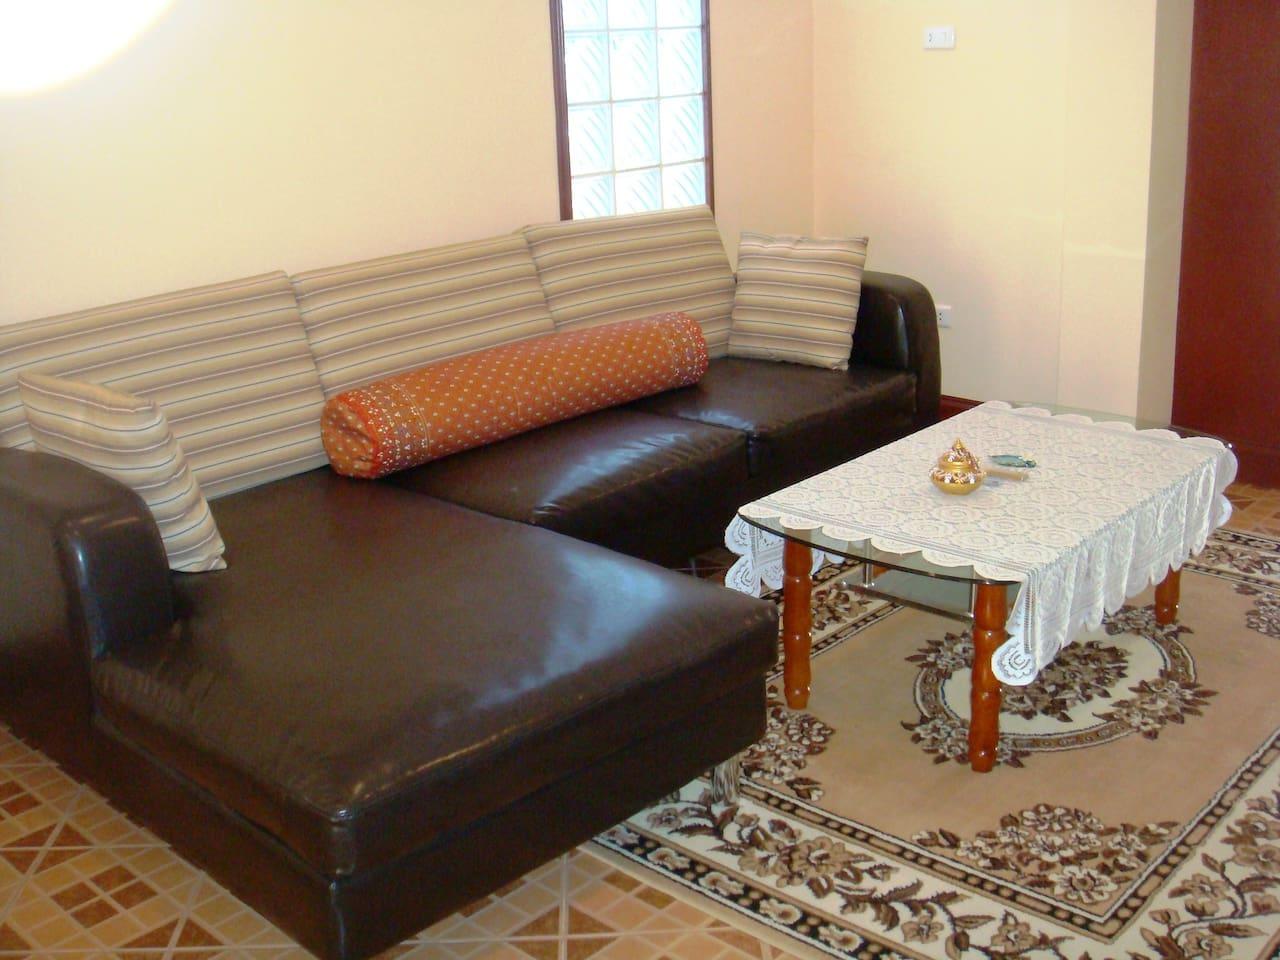 Living room, sofa and coffee table.